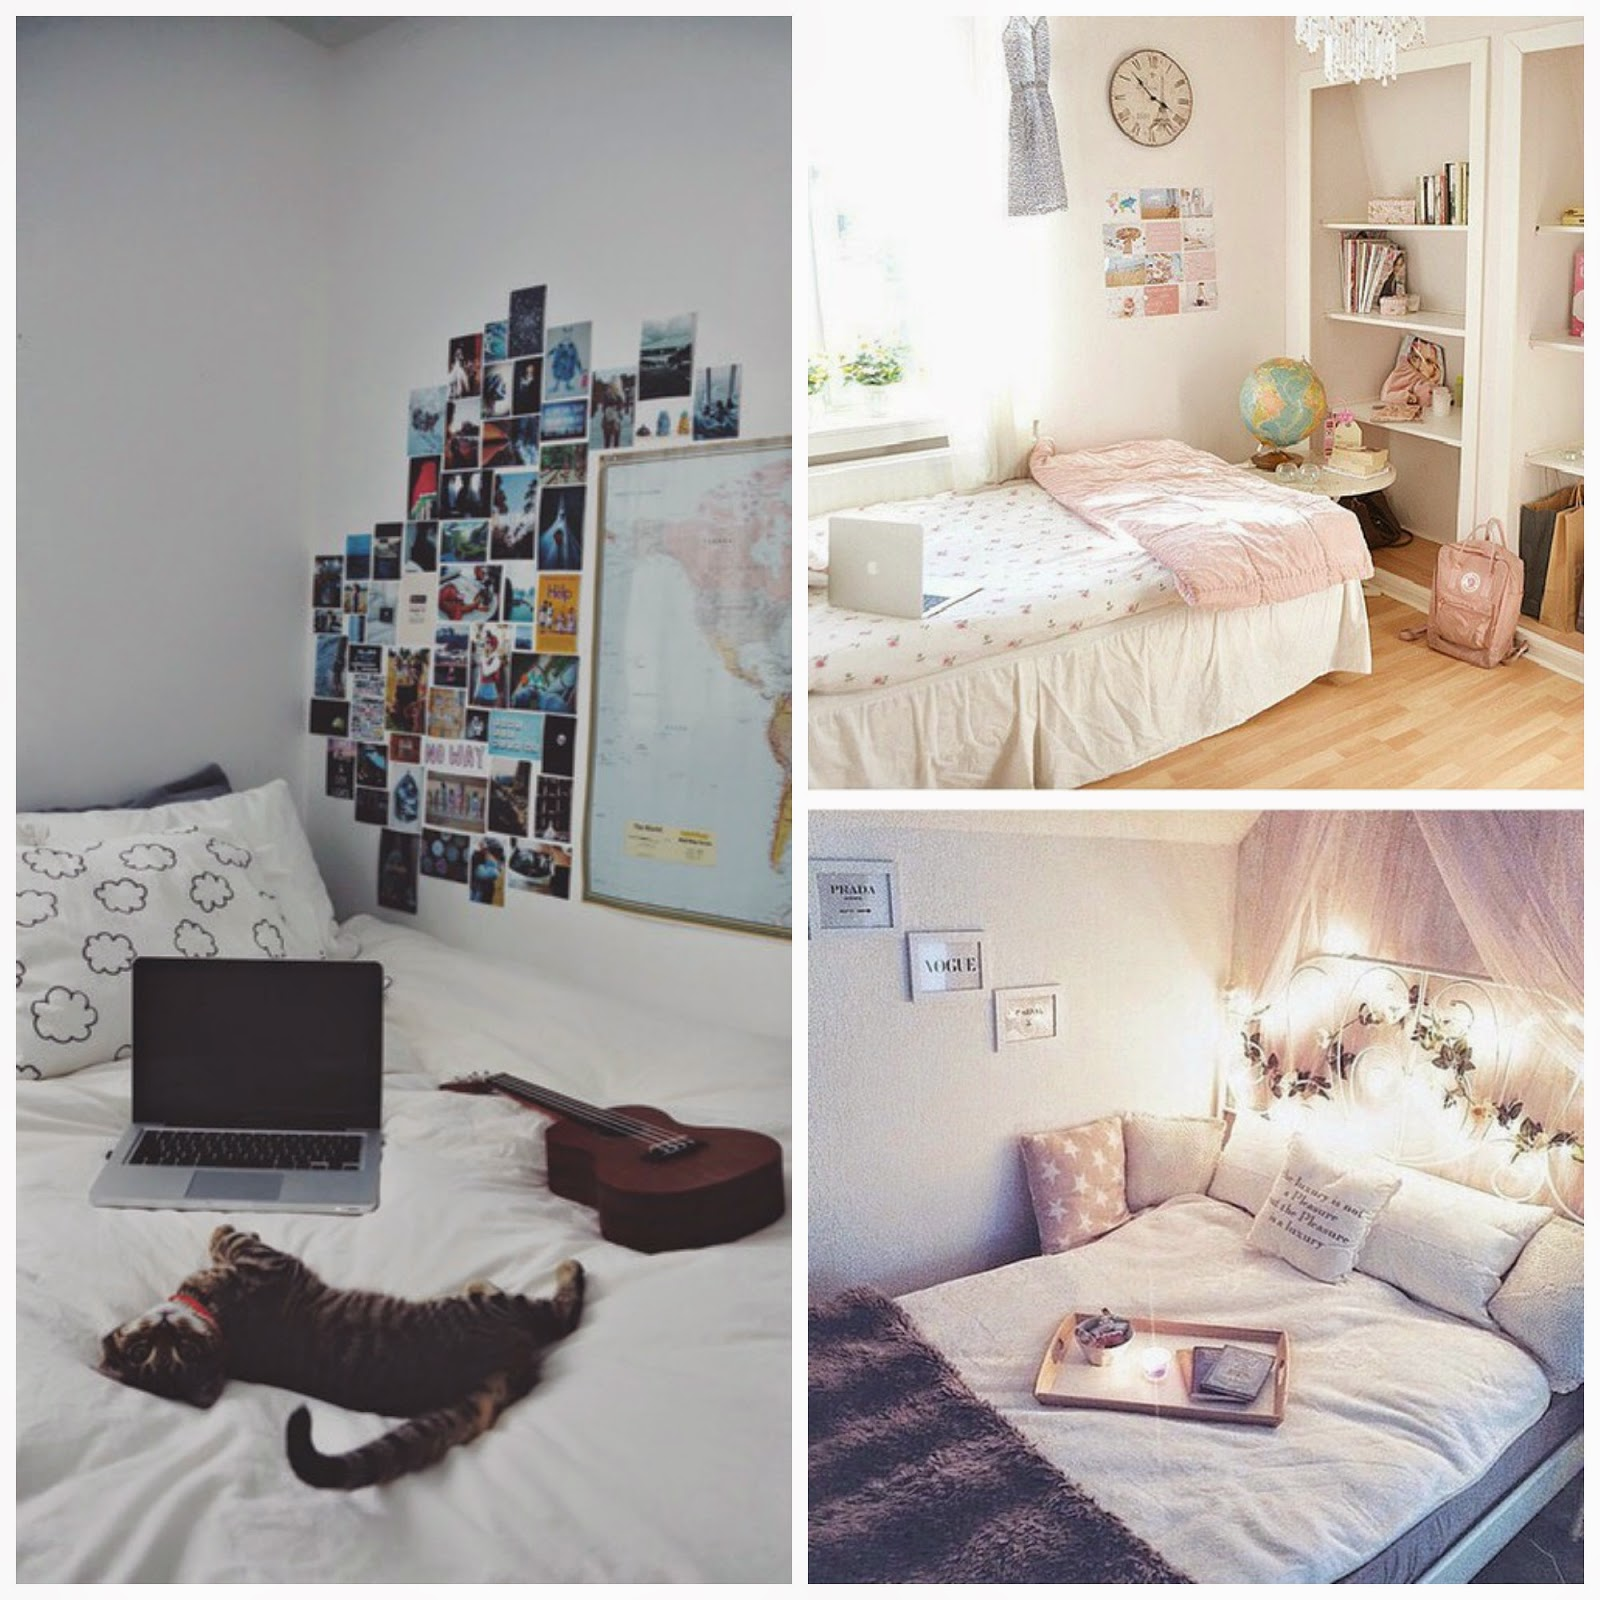 Jonne lucia meiden kamer inspiratie - Kleedkamer voor mansard kamer ...